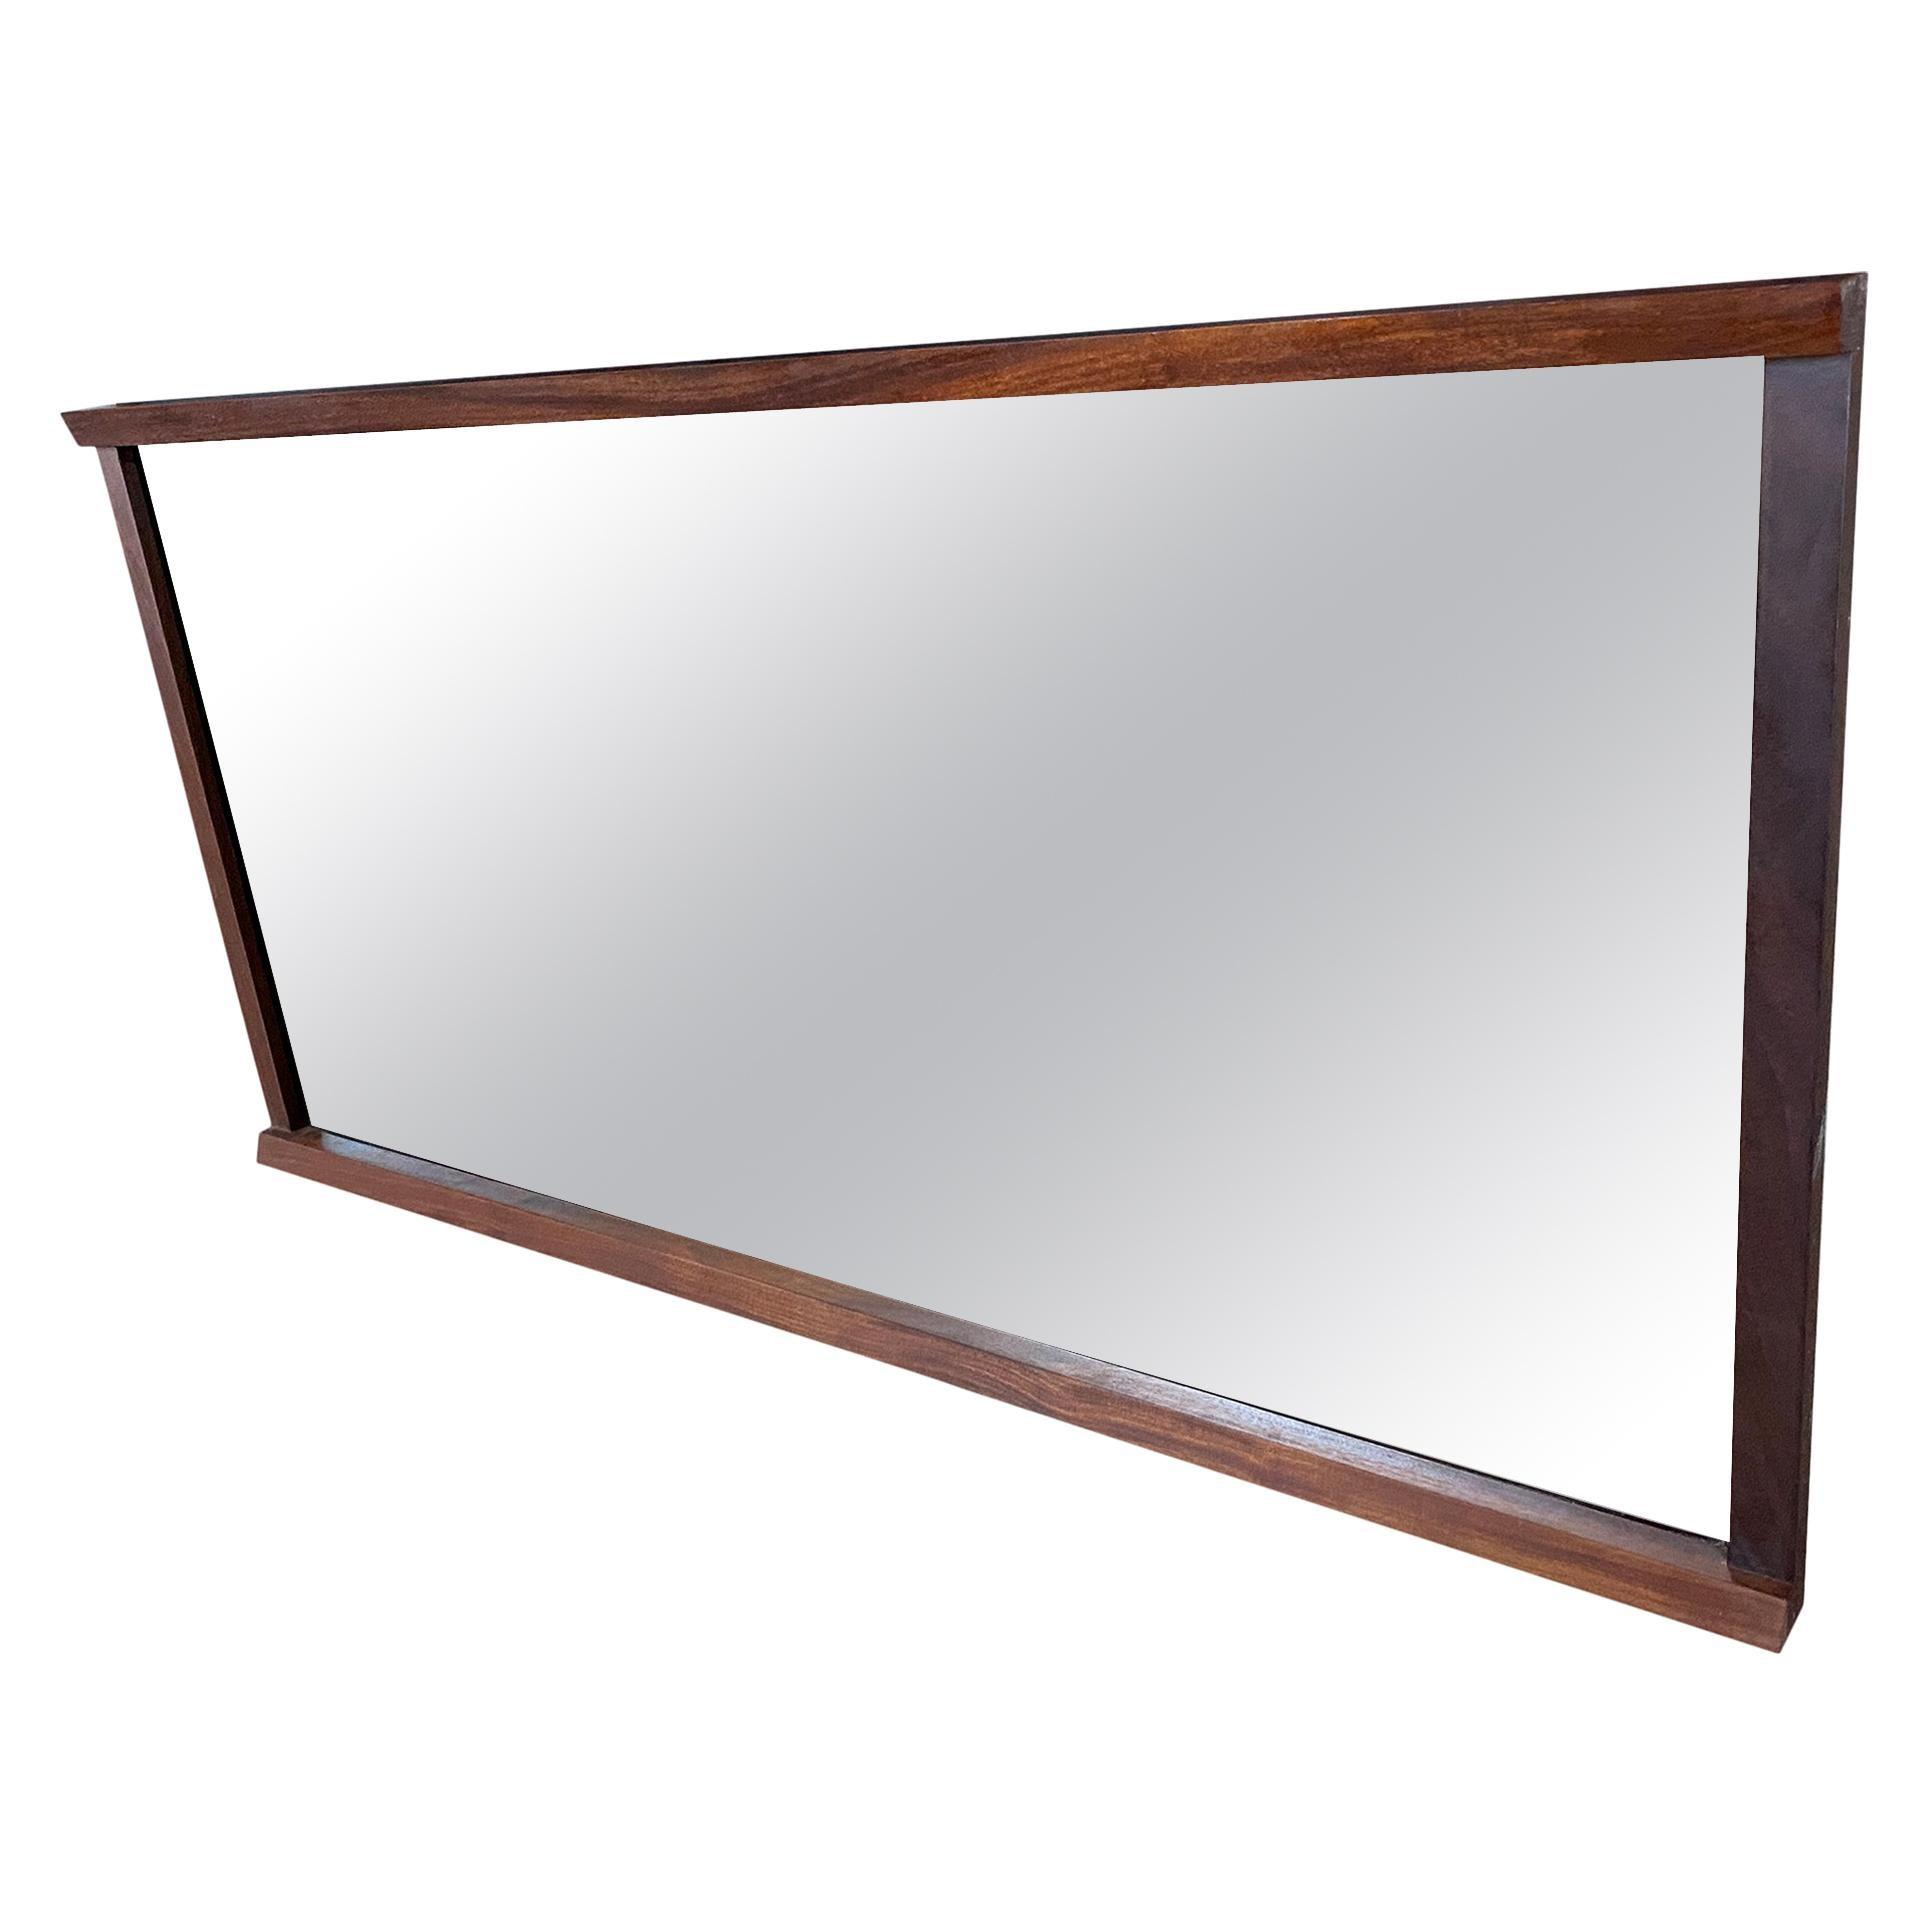 Midcentury Walnut Mirror with Tsugite Joint Very Beautiful Style of Nakashima